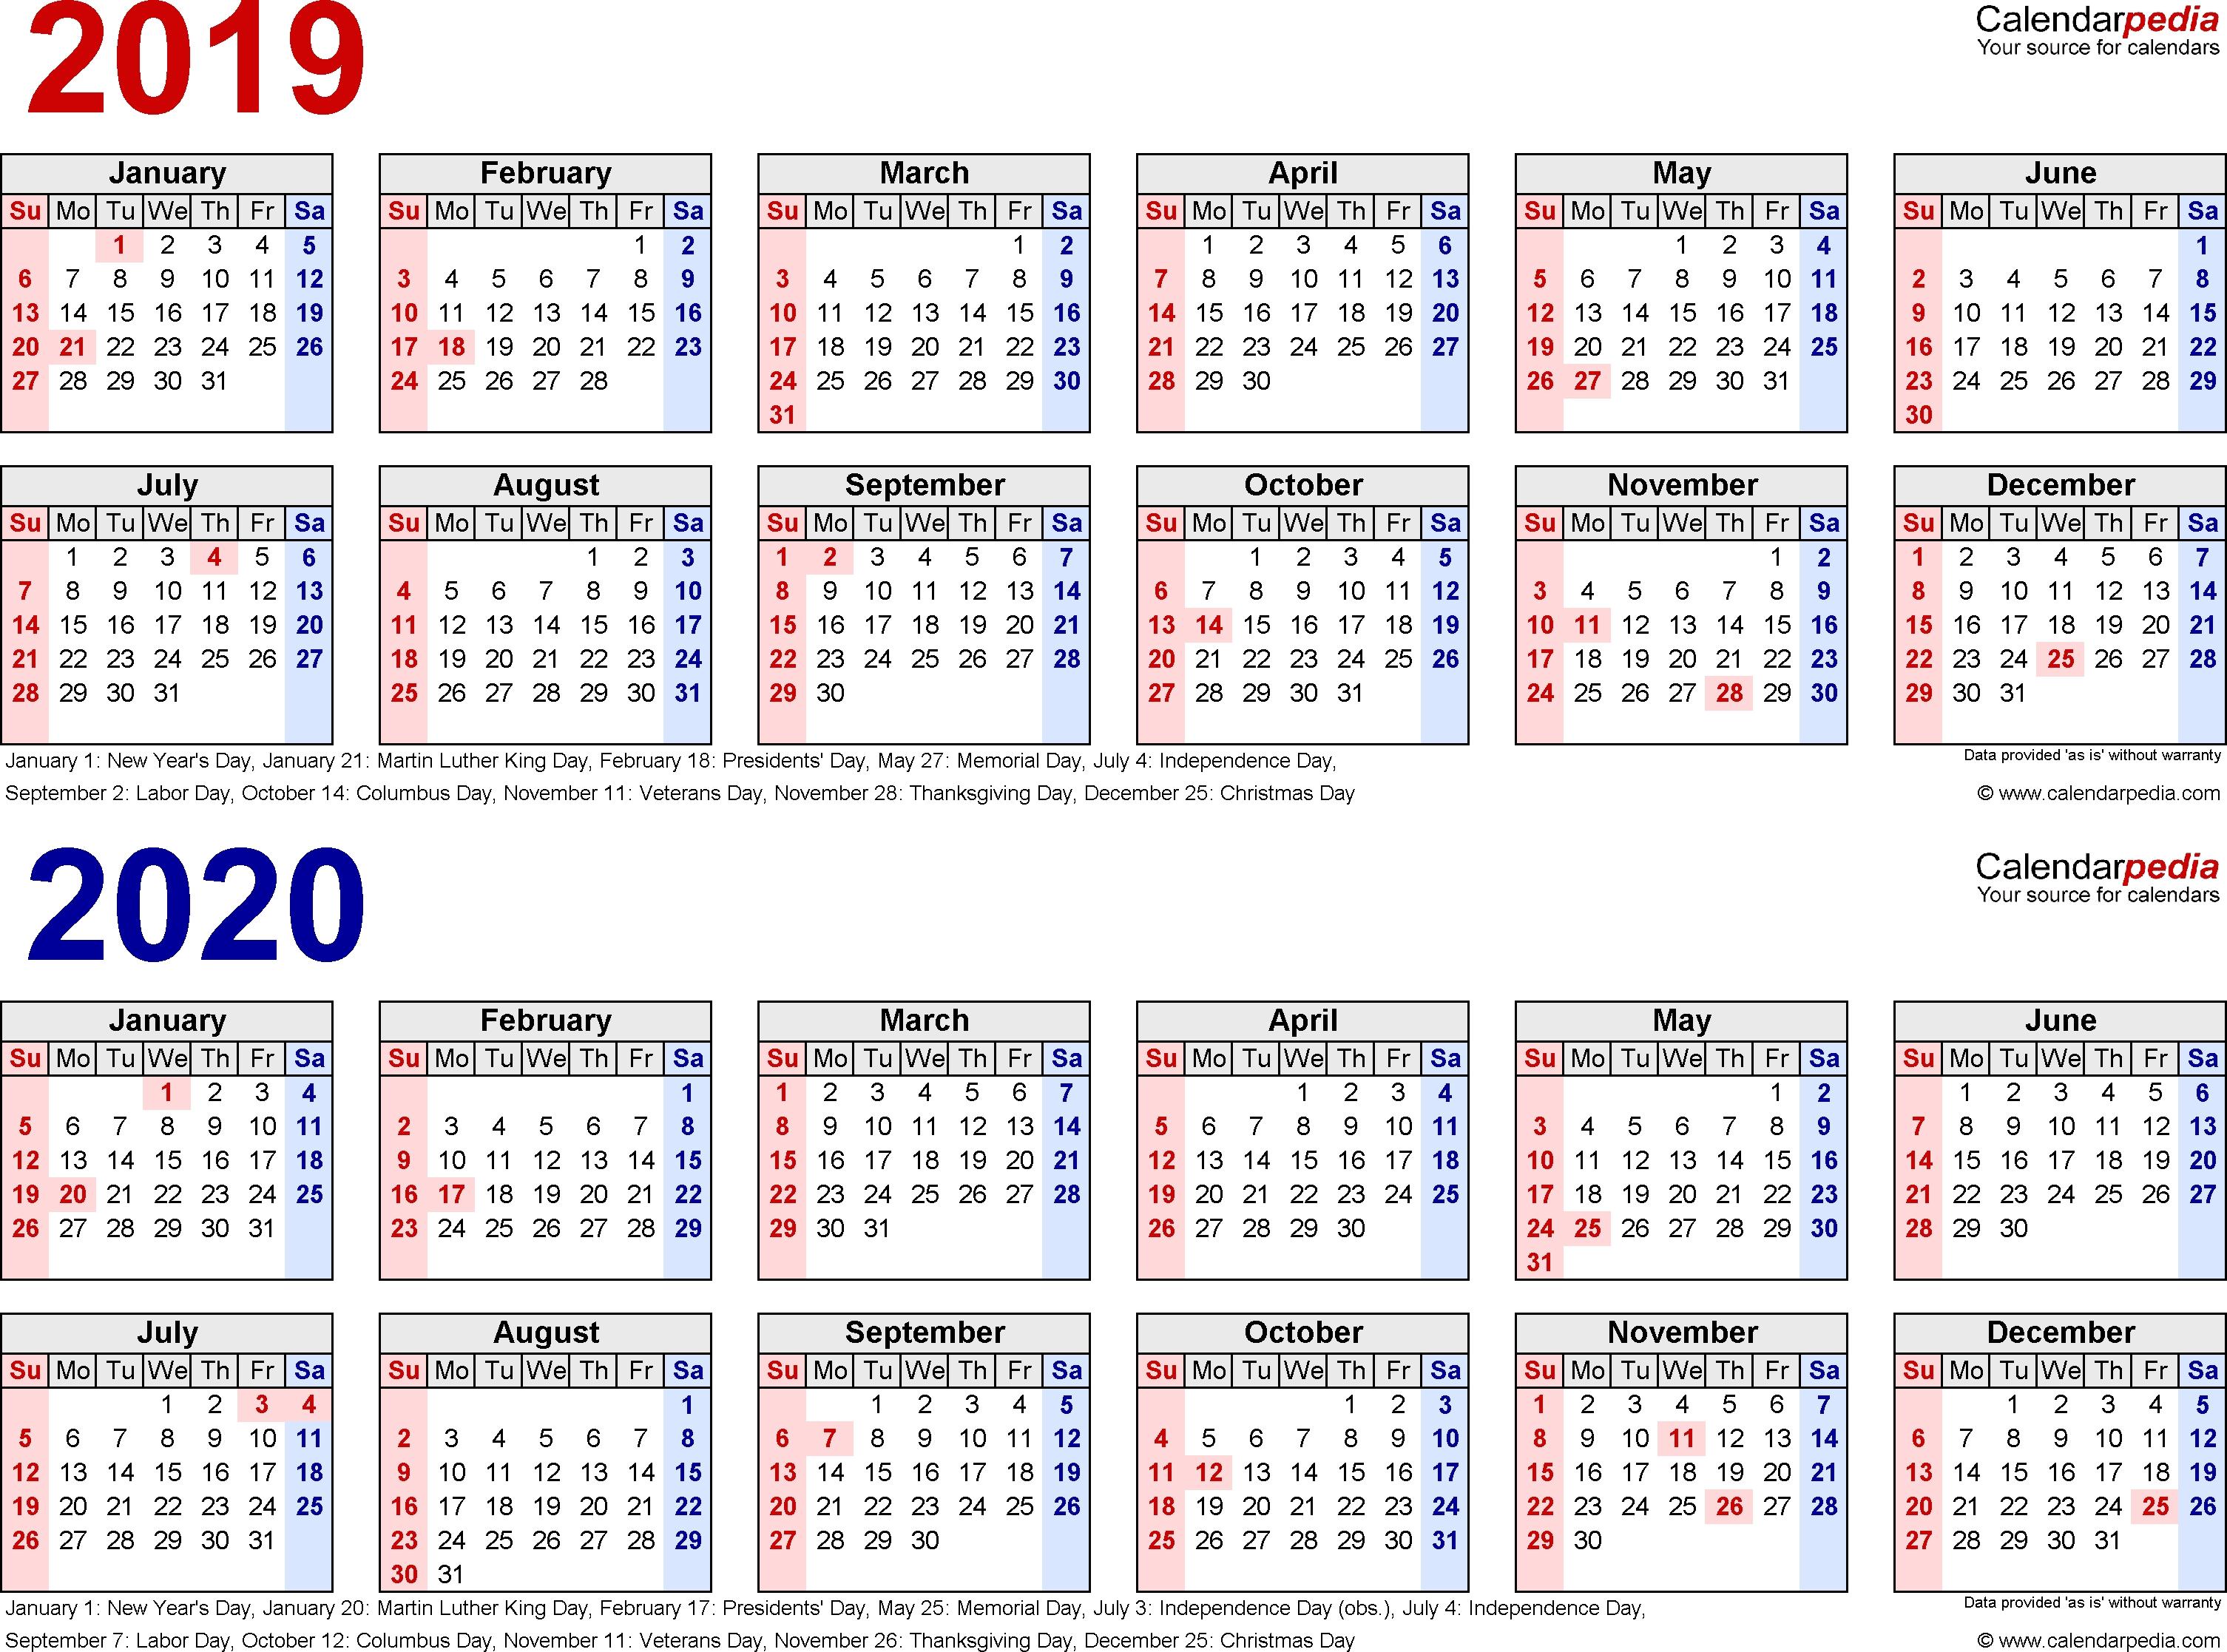 2019-2020 Calendar - Free Printable Two-Year Pdf Calendars regarding Year Long Calendar For 2019-2020 Printable